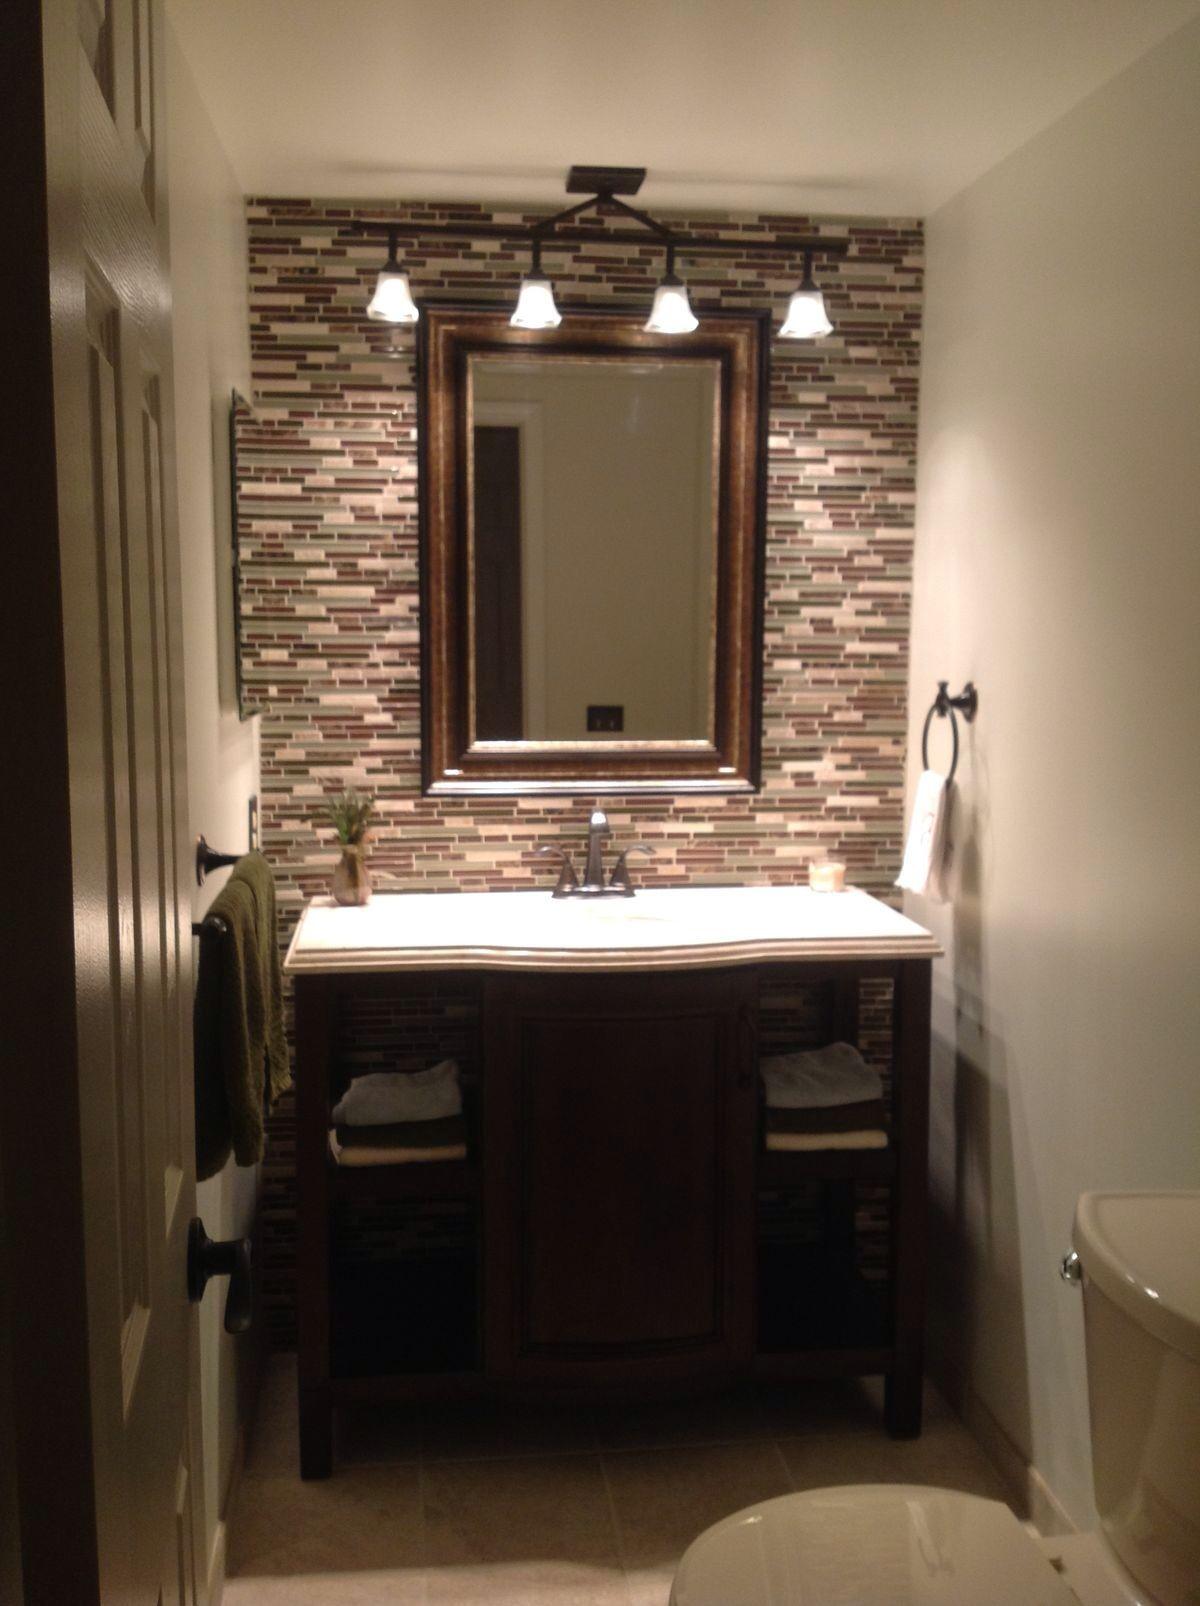 26 Half Bathroom Ideas And Design For Upgrade Your House Decorar